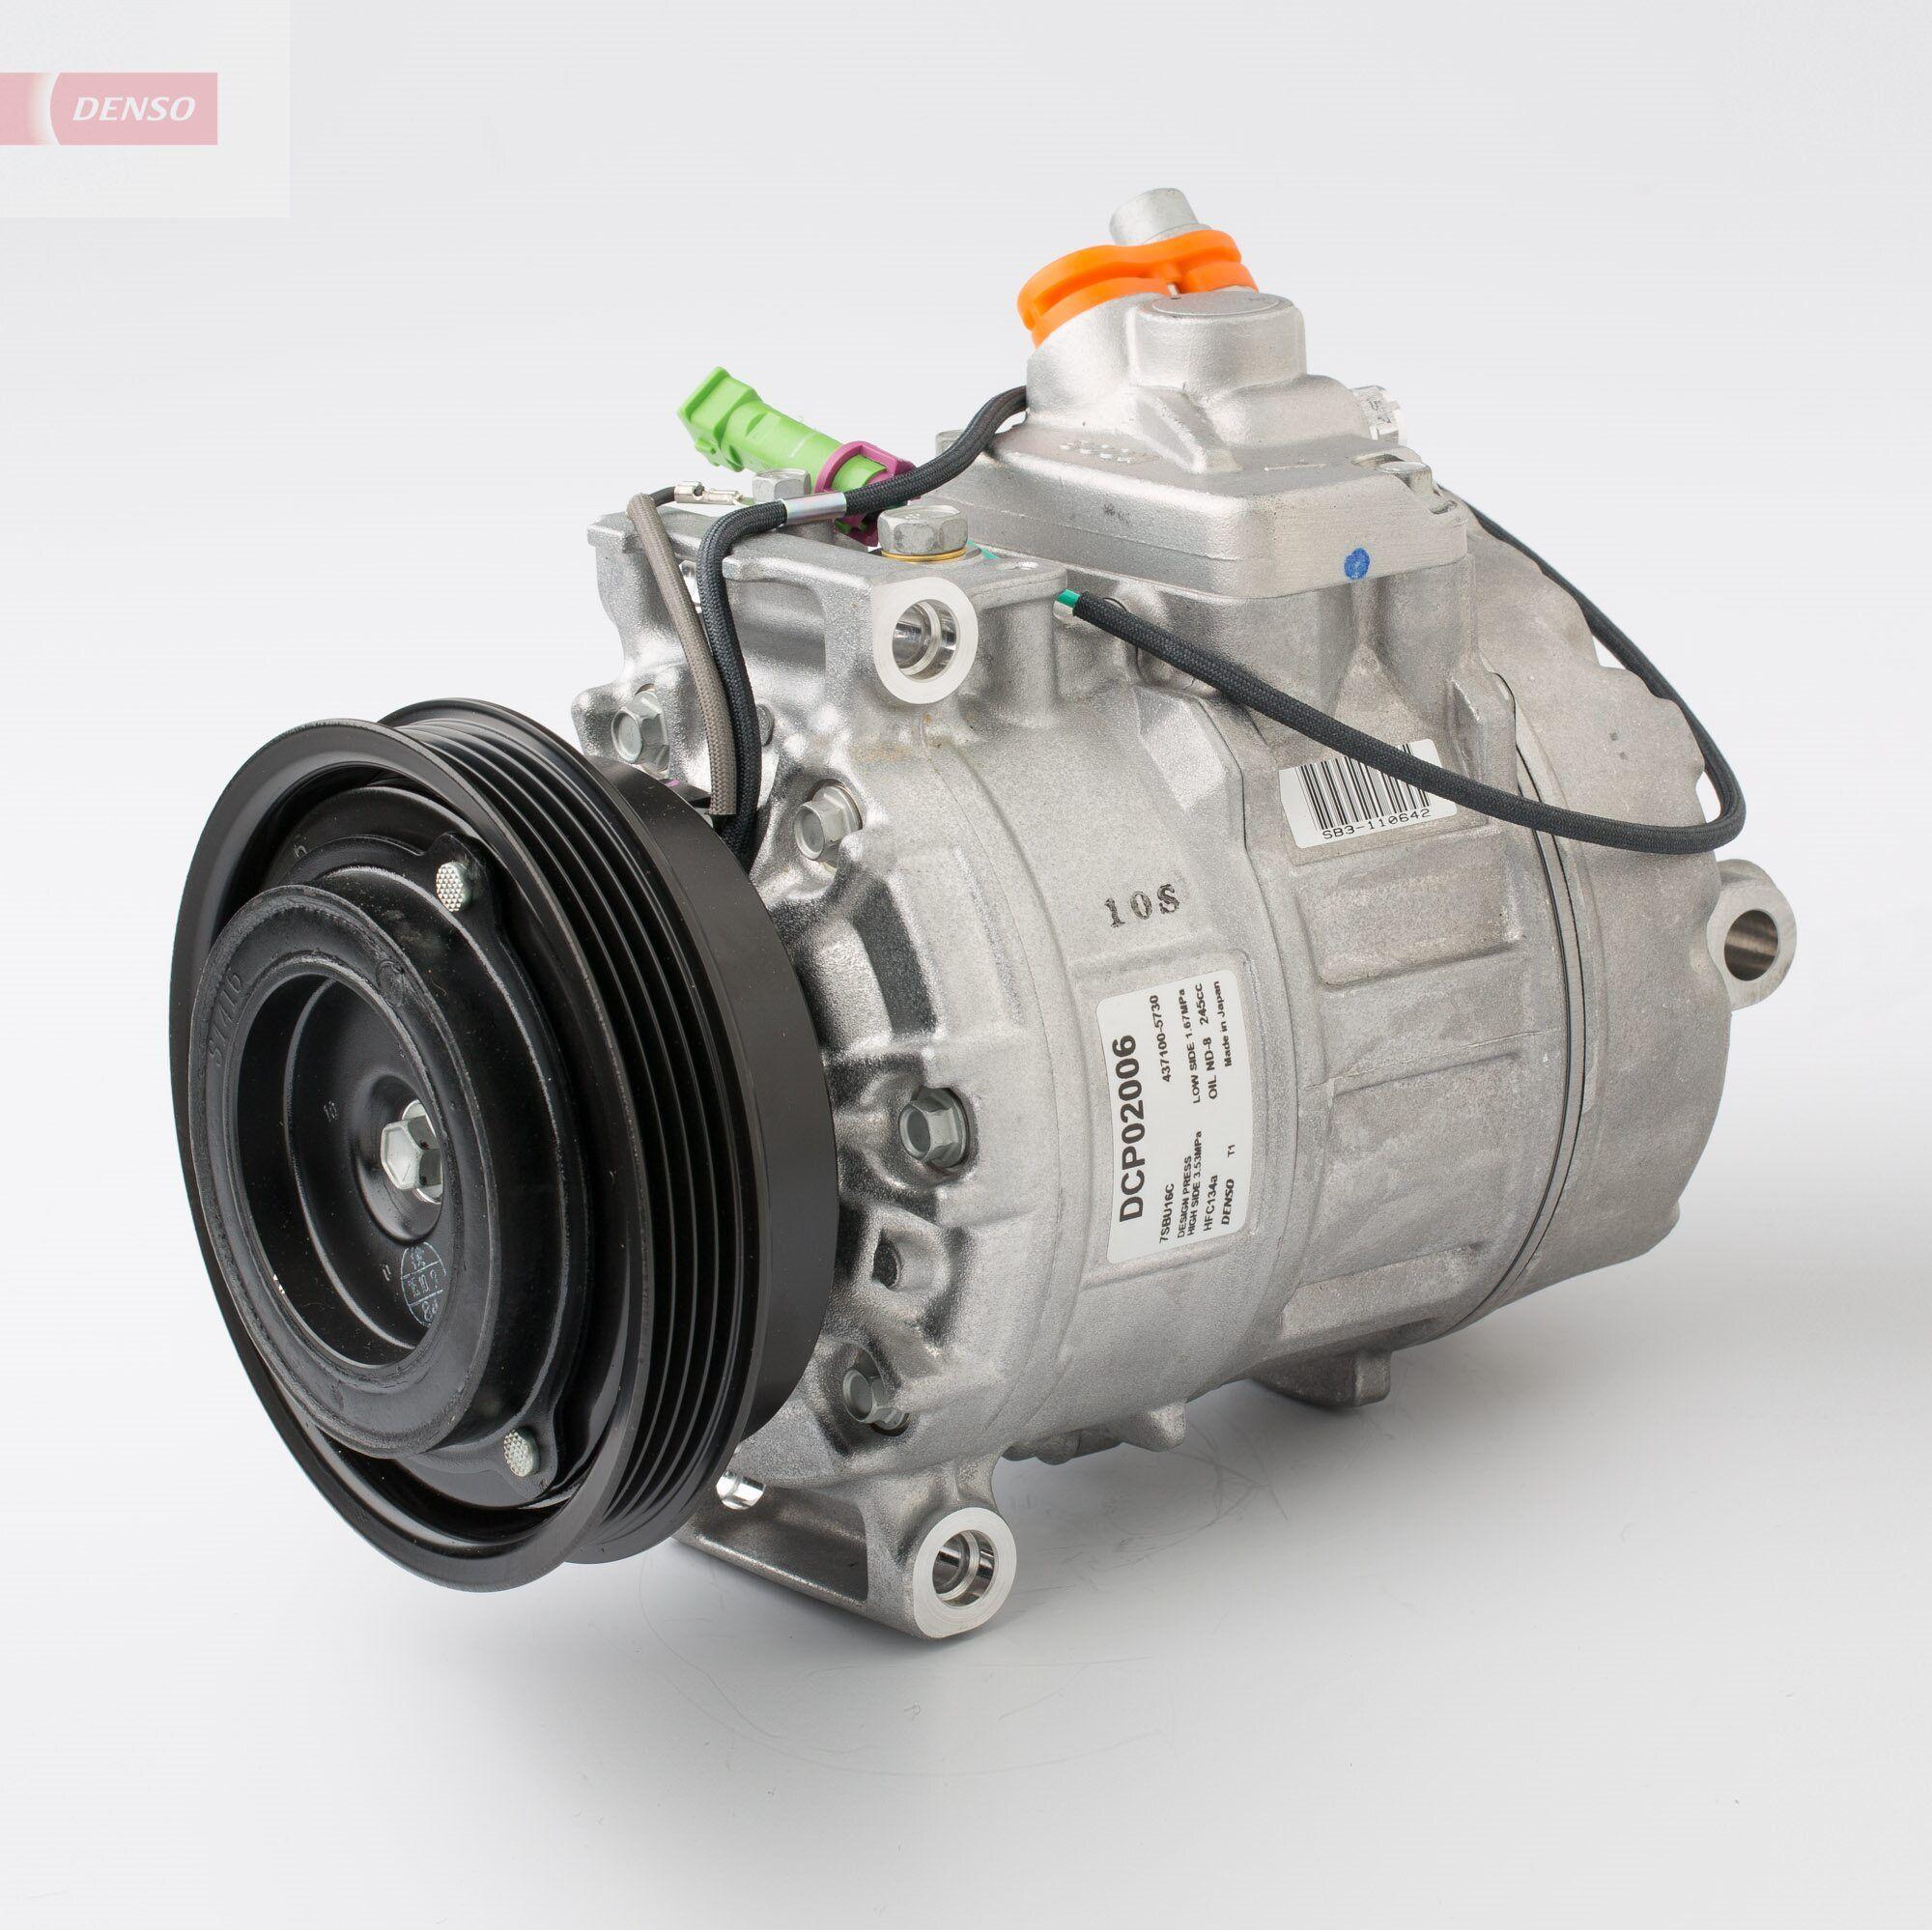 Kompressor Klimaanlage DENSO DCP02006